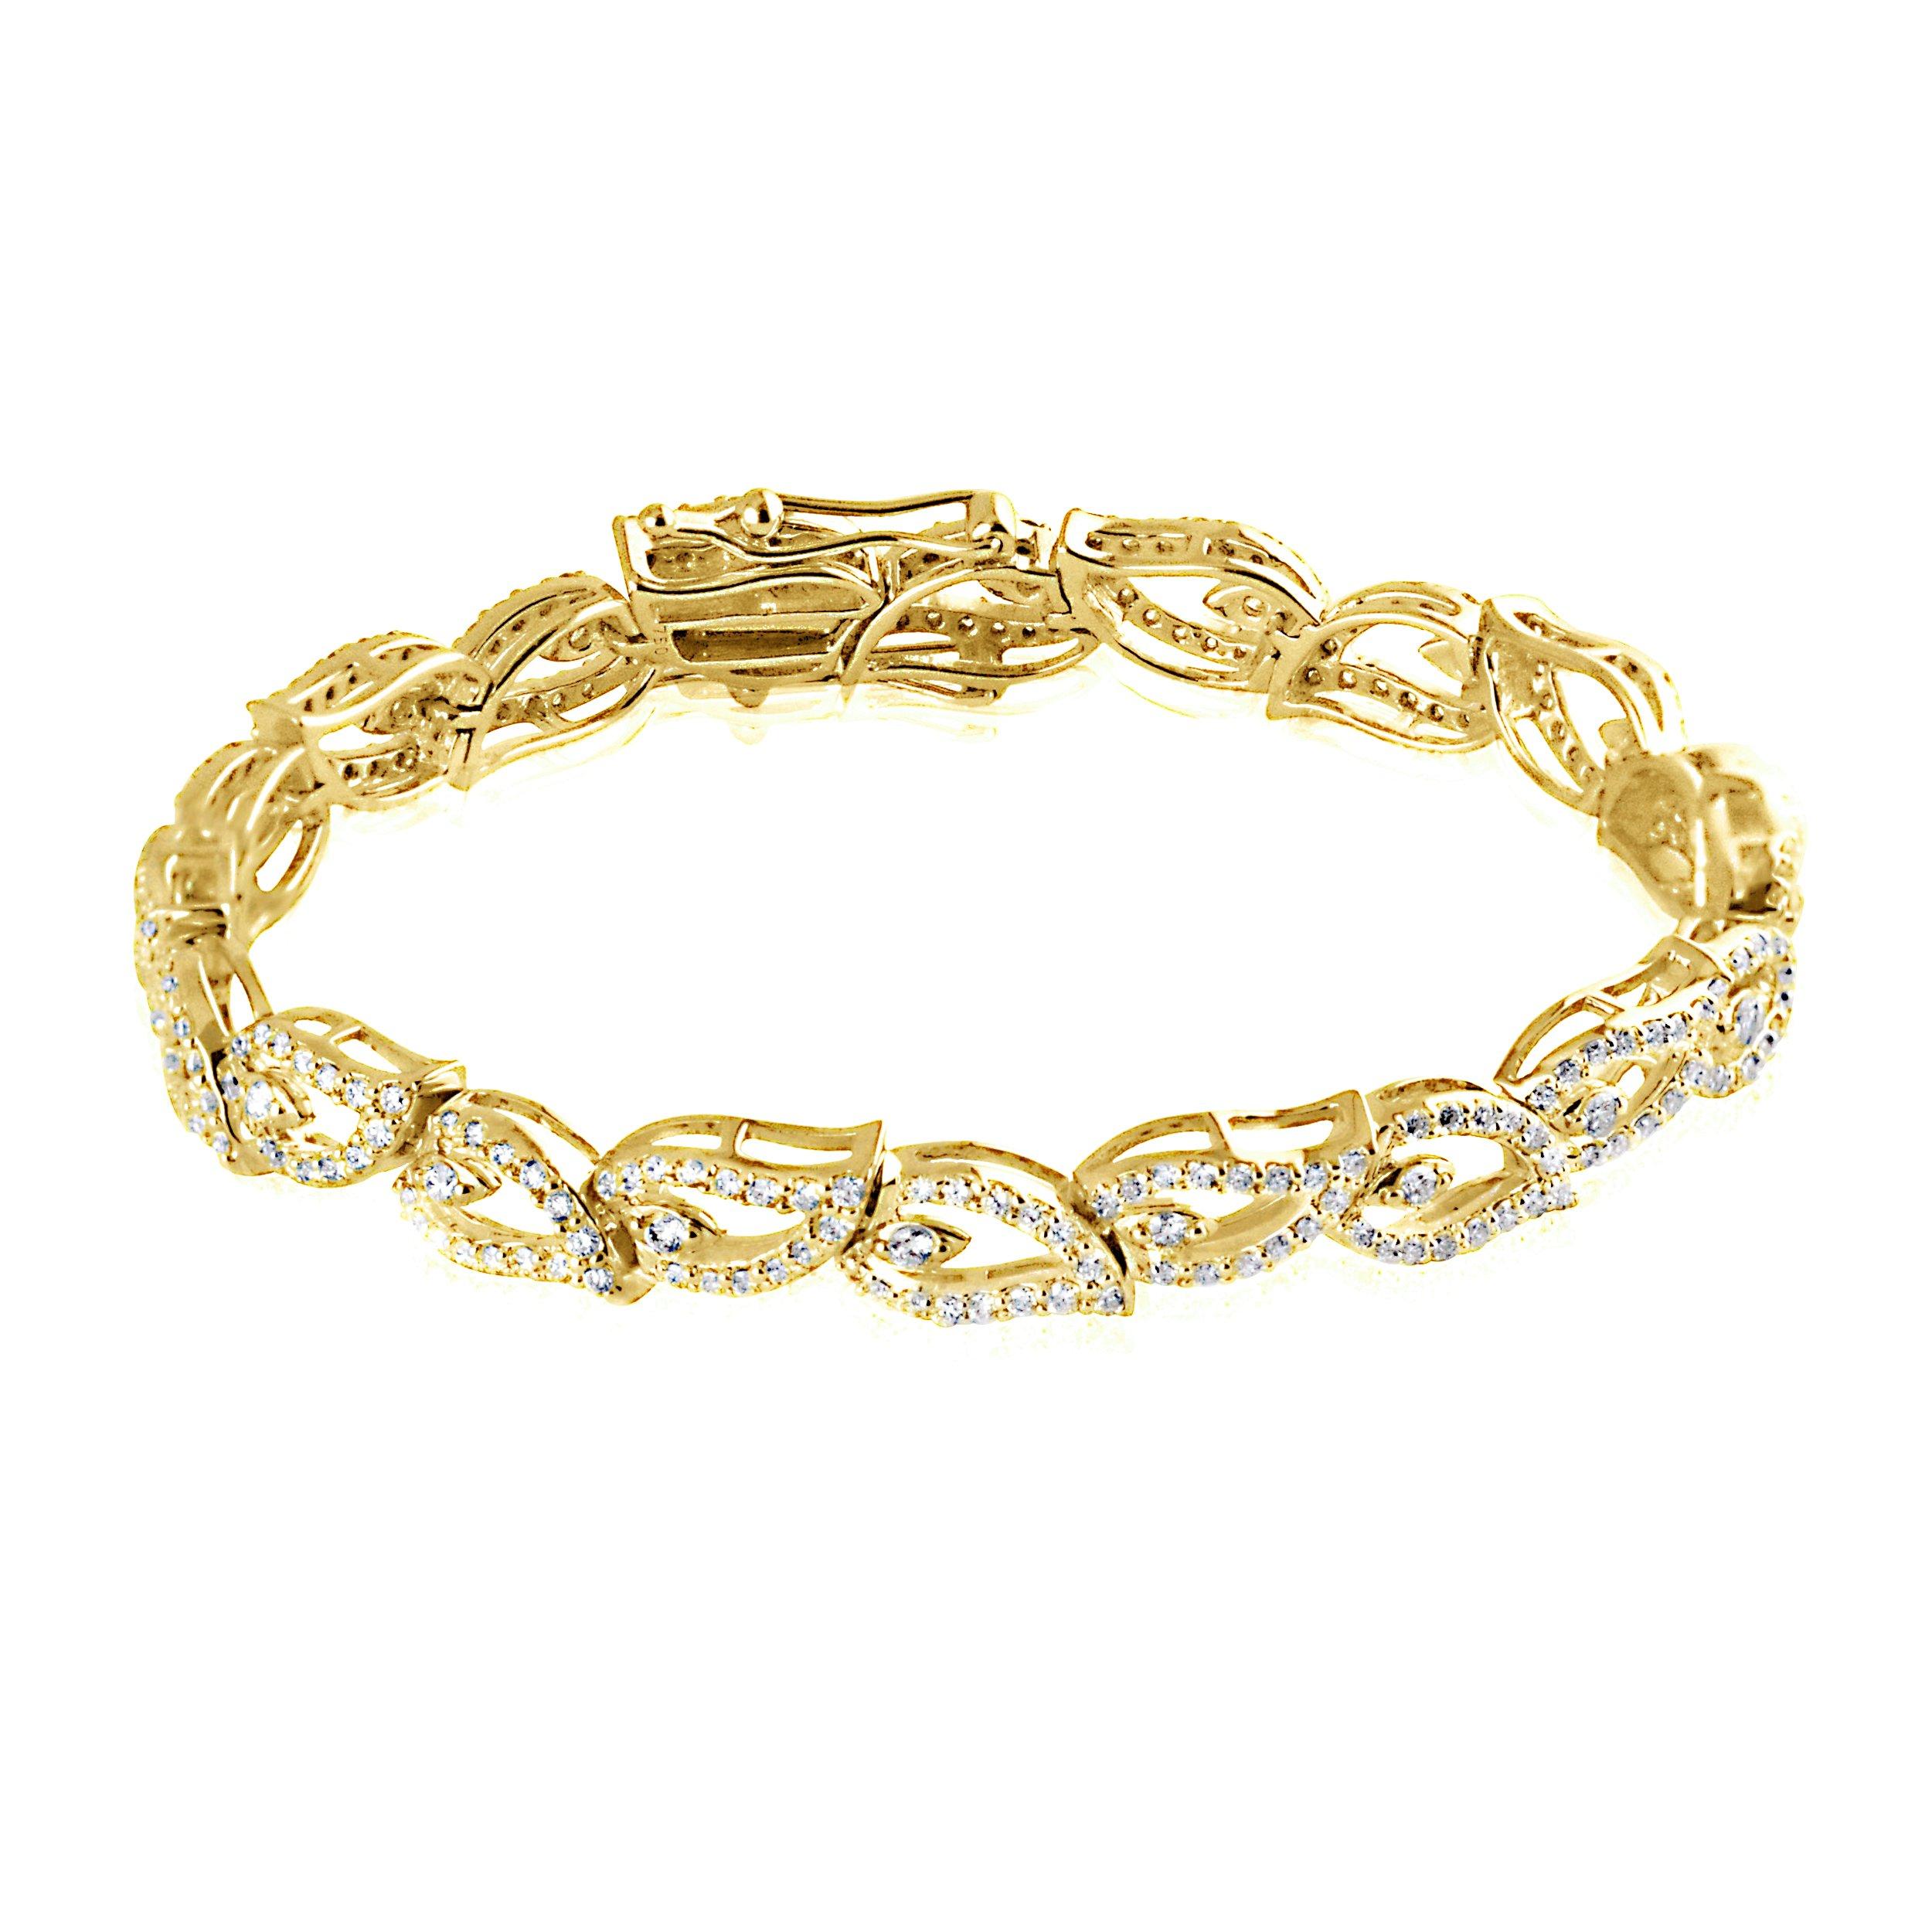 18K Yellow Gold 1.70 Carat (ctw) Natural Diamond Leaf Style Link Fine Bracelet for Women